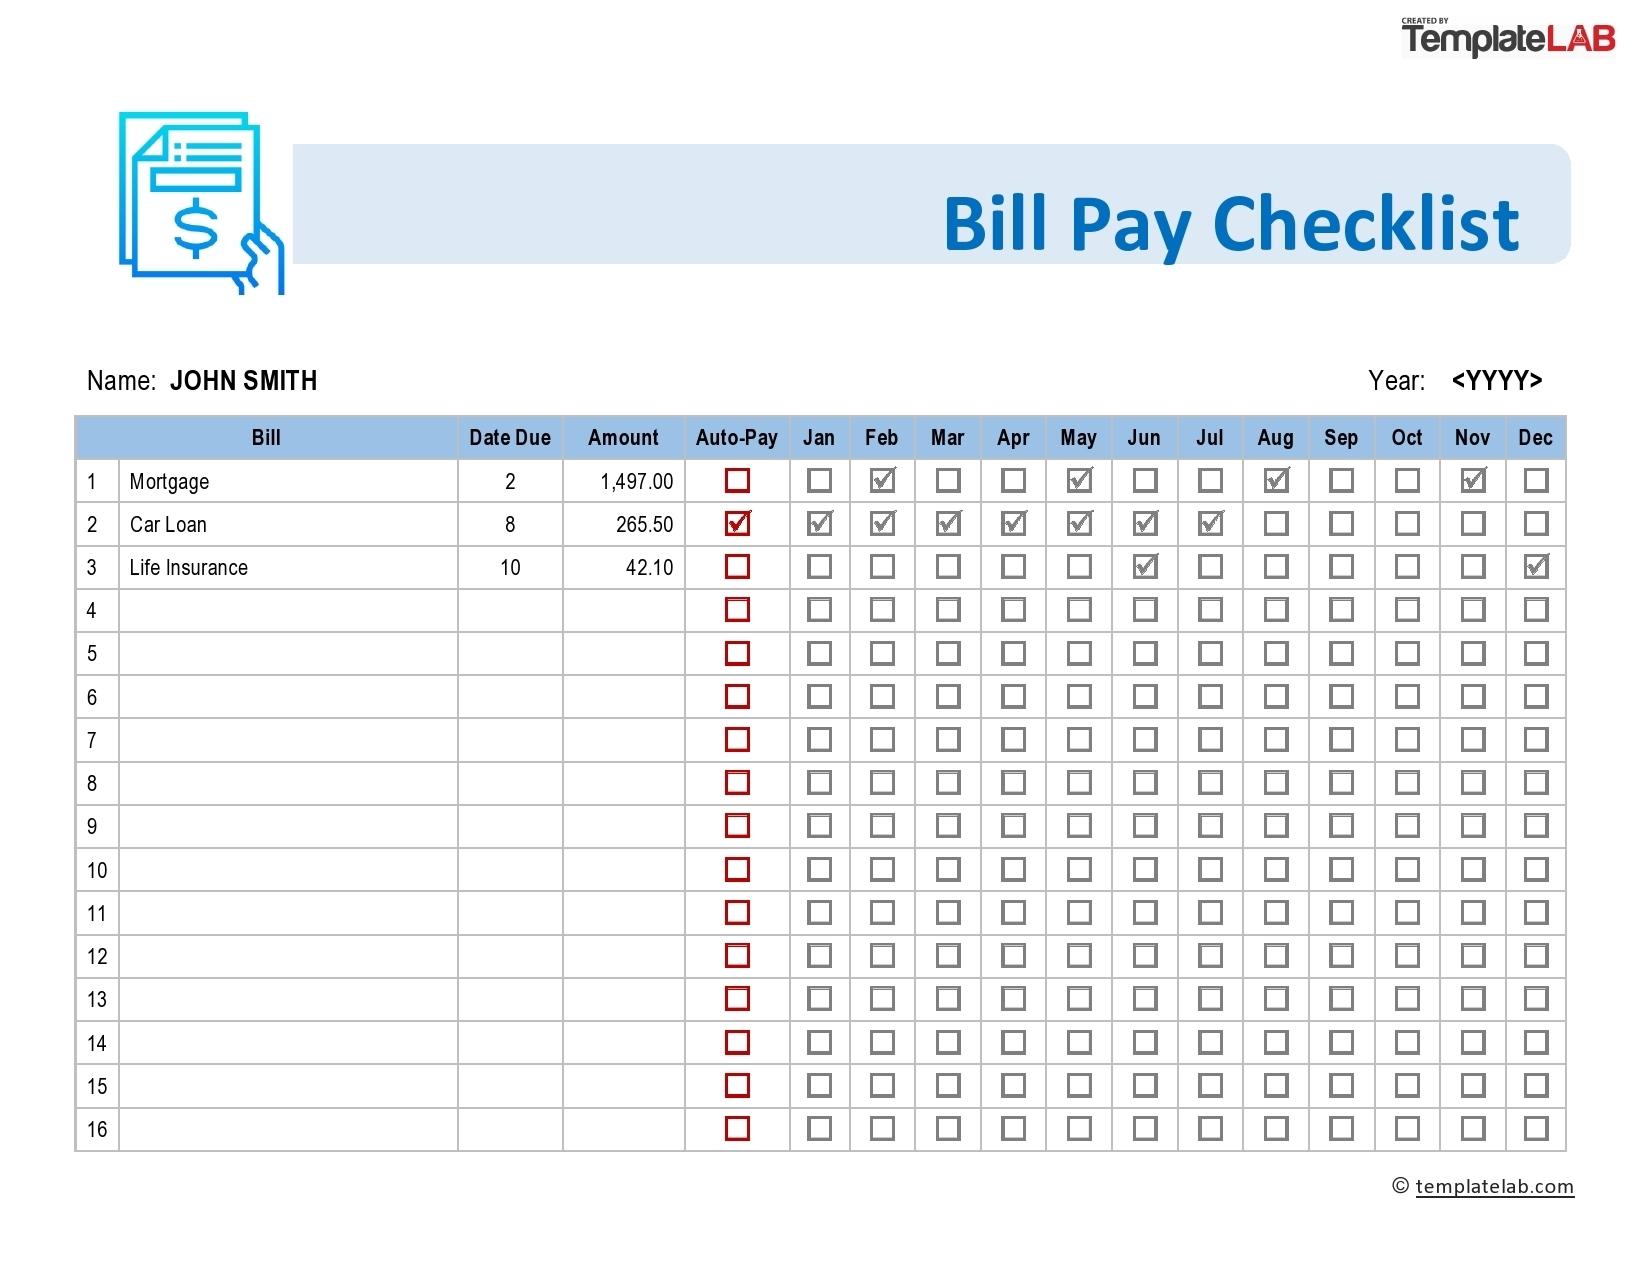 Pick Check List Of Bills Due